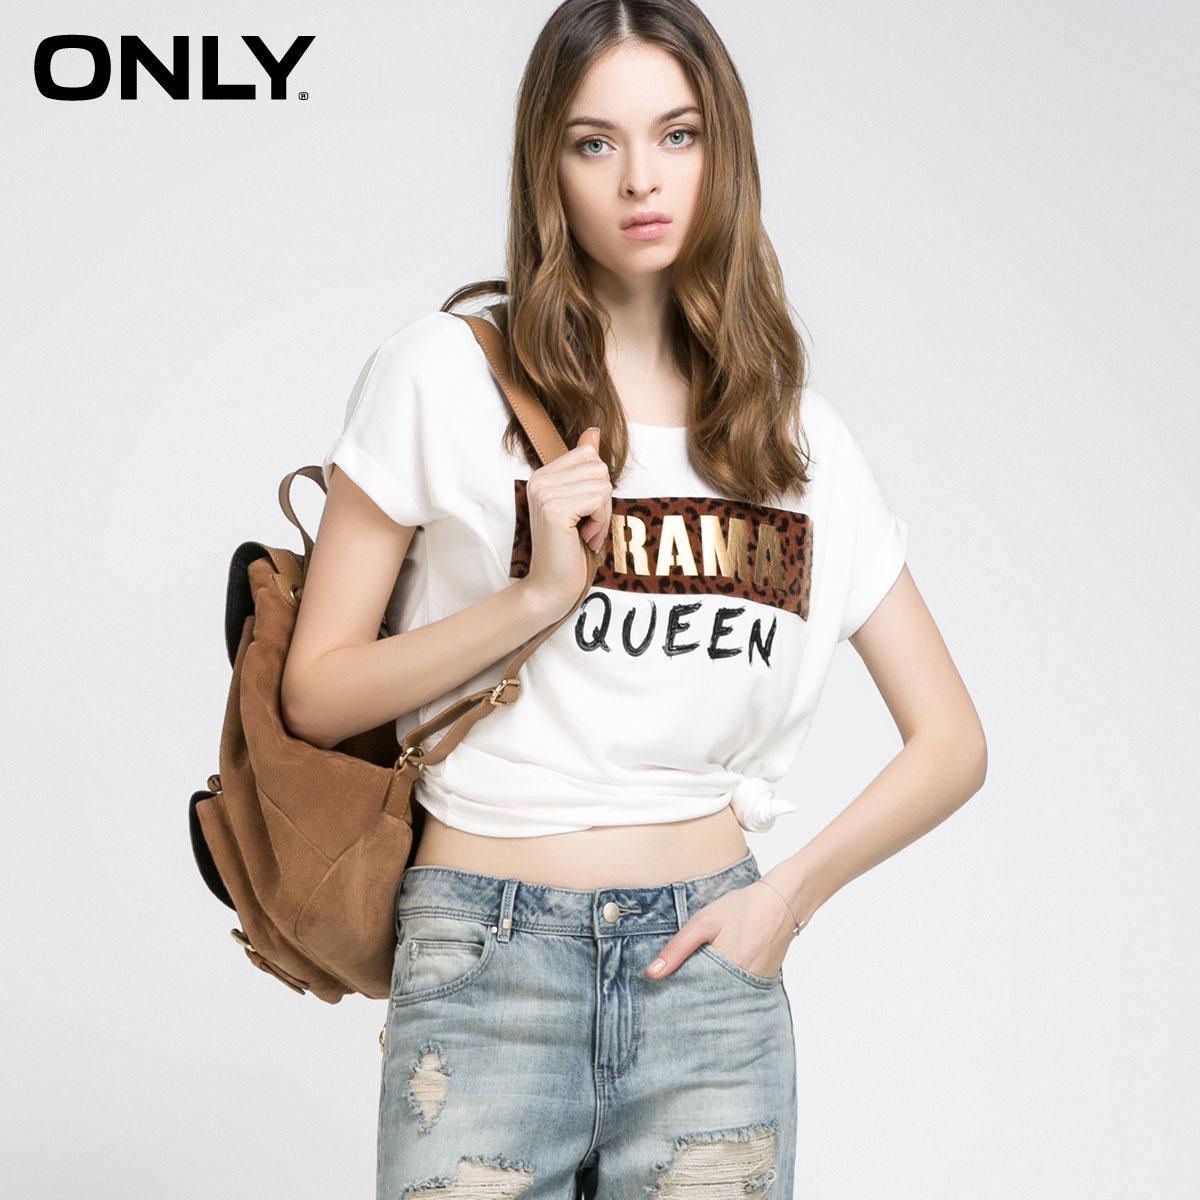 ONLYT恤怎么样,ONLY女装质量好吗